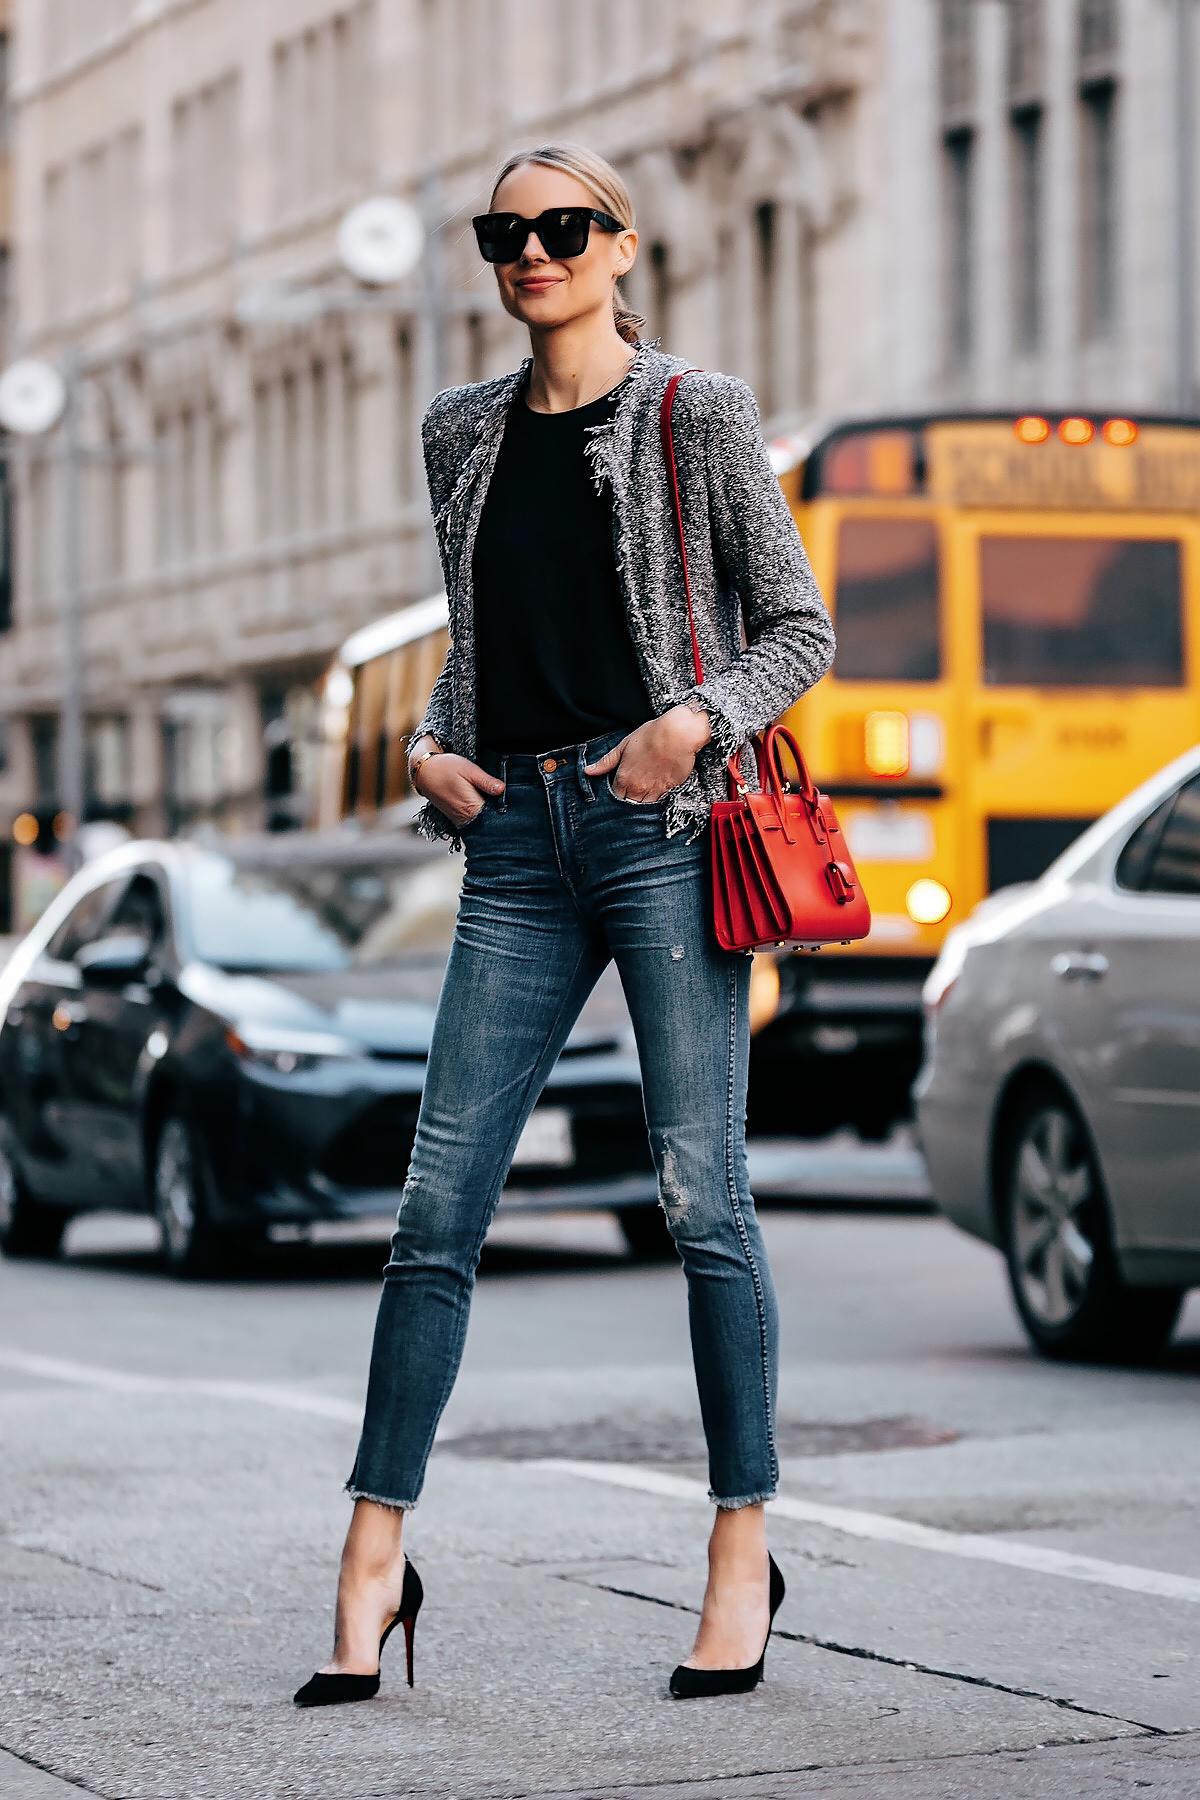 Blonde Woman Wearing IRO Grey Tweed Jacket Black Top Denim Ripped Skinny Jeans Black Pumps Red YSL Sac De Jour Nano Fashion Jackson San Diego Fashion Blogger Street Style